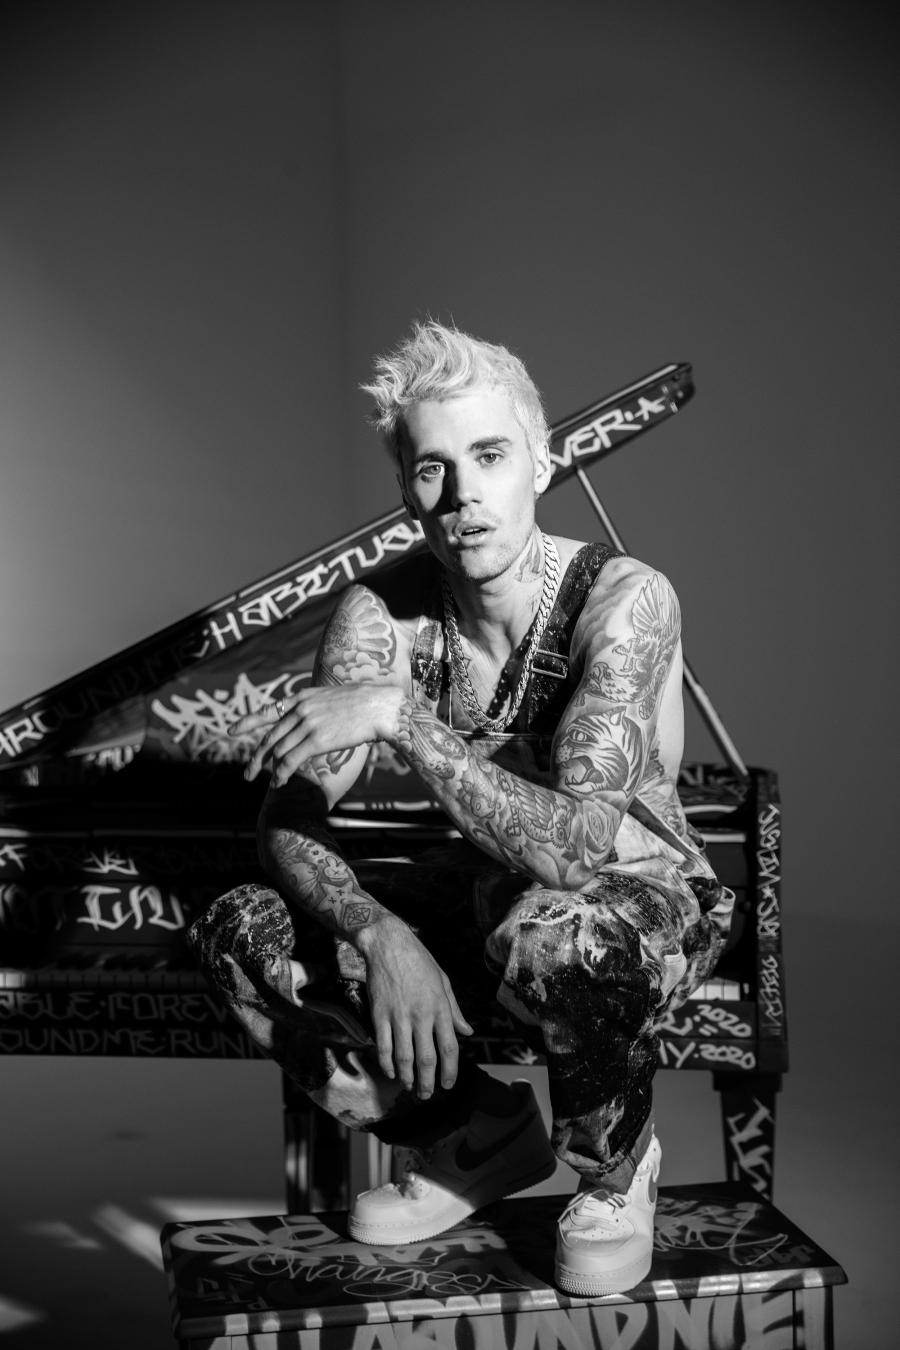 Justin-Bieber_Photo01_2020_Universal-Music